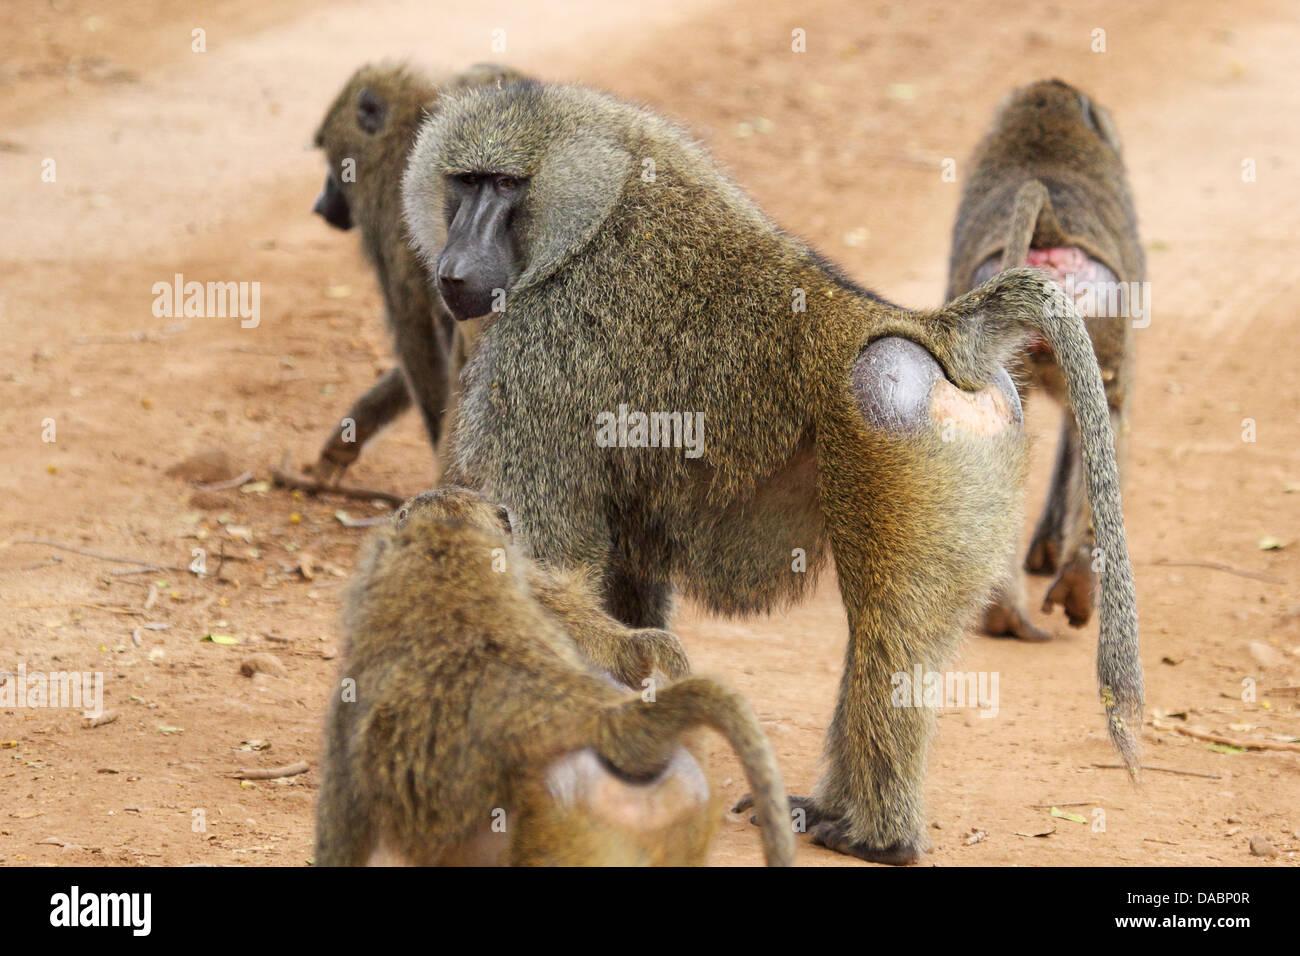 Eating Baboon Tree Banana